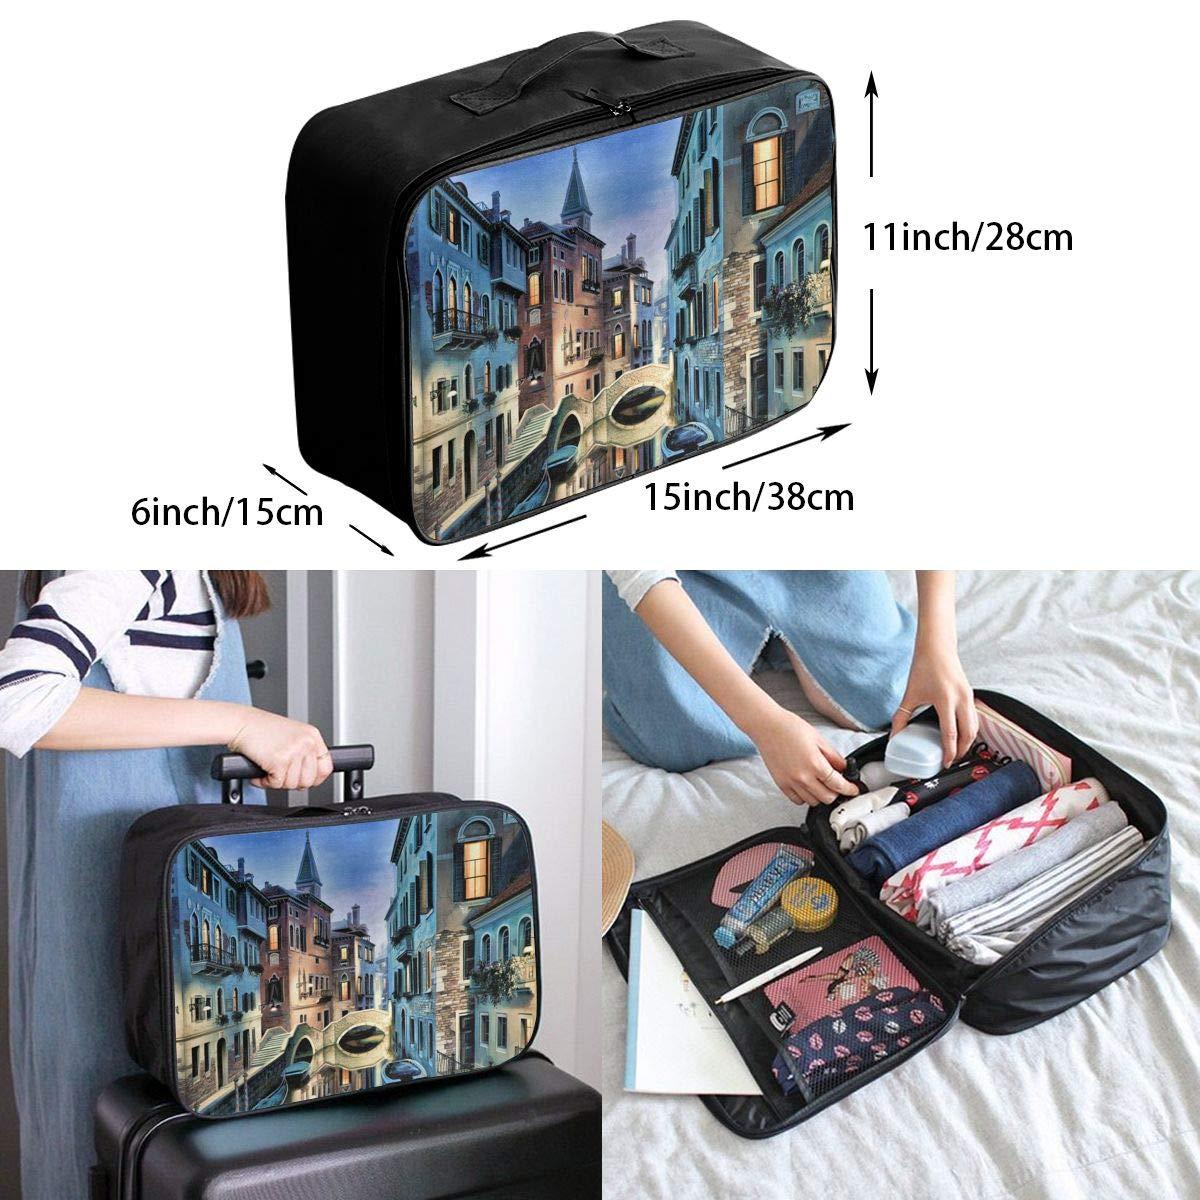 Travel Luggage Duffle Bag Lightweight Portable Handbag Beautiful City Pattern Large Capacity Waterproof Foldable Storage Tote